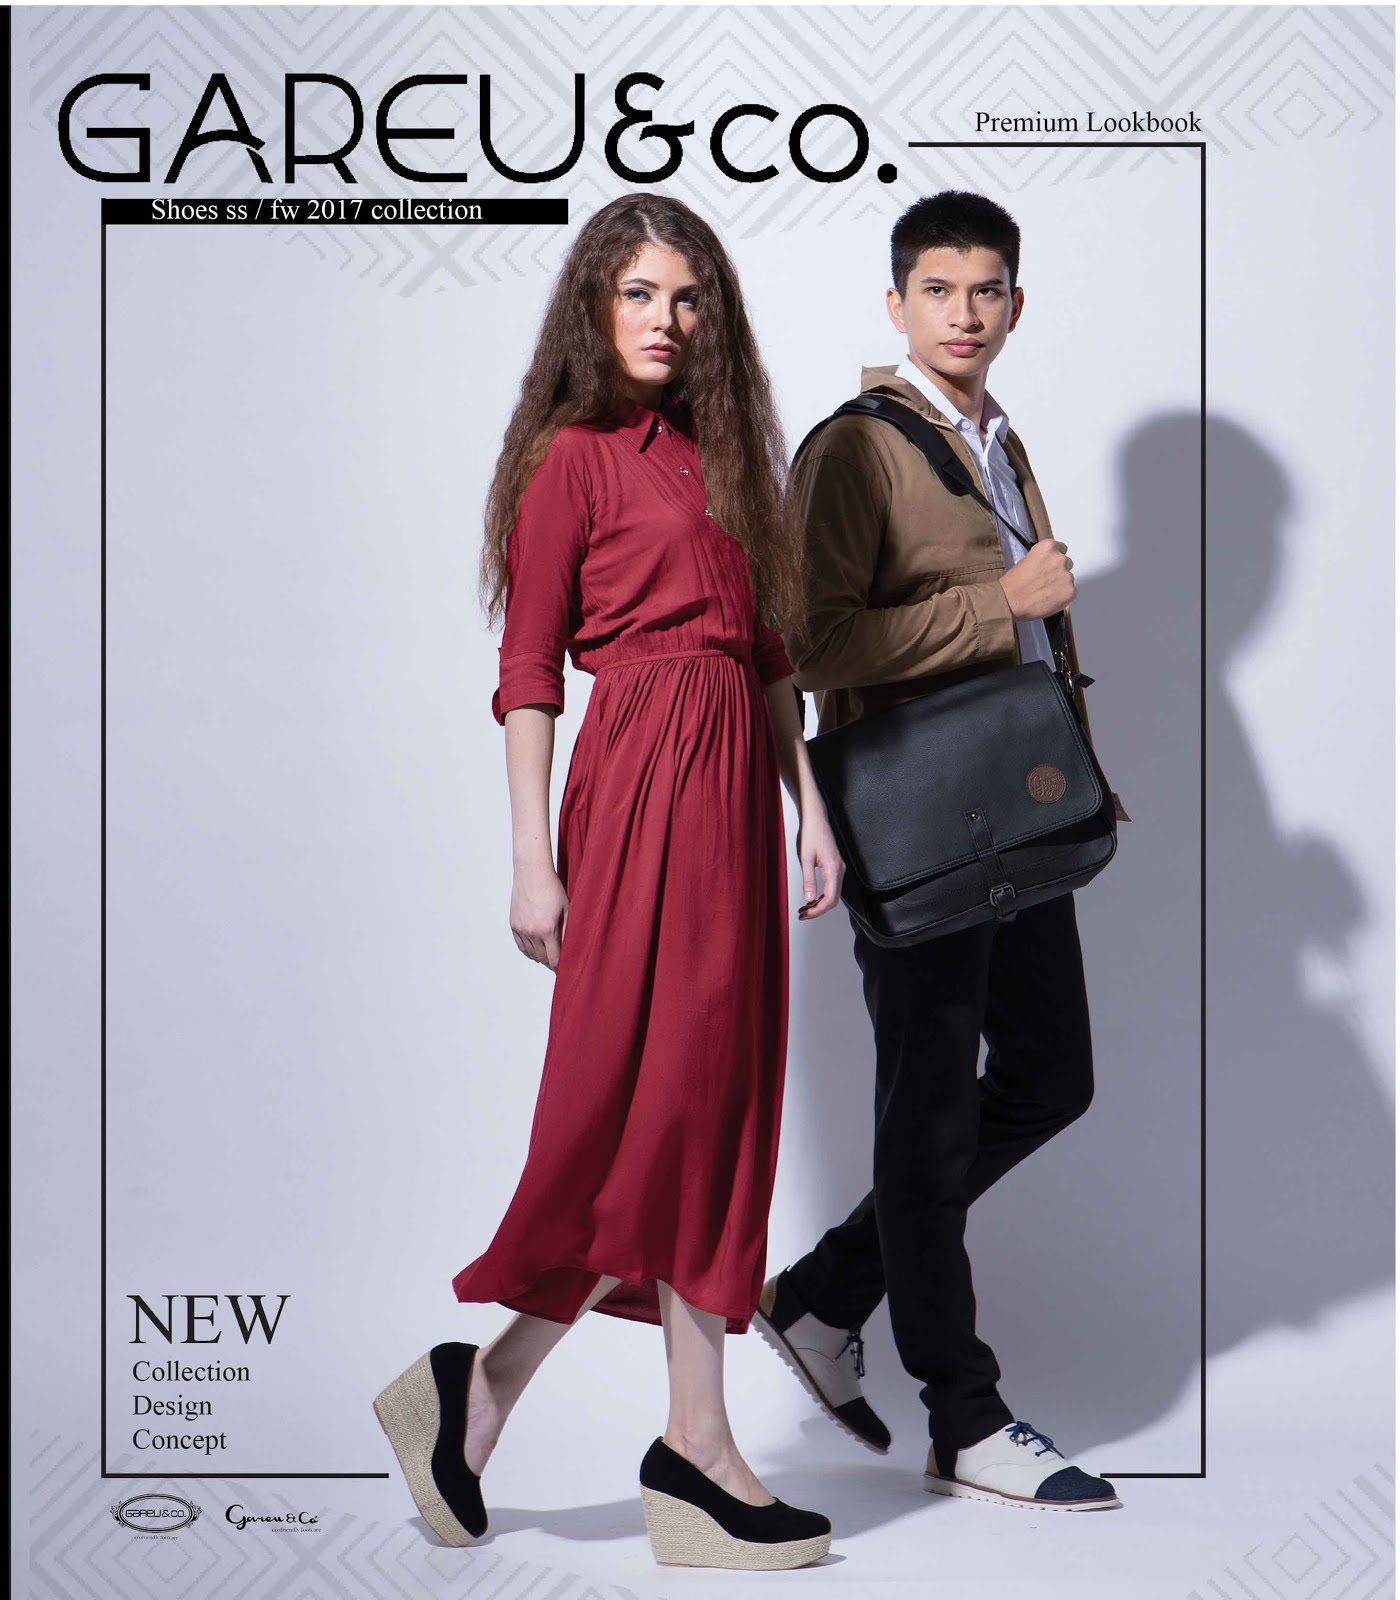 Katalog Gareu&co